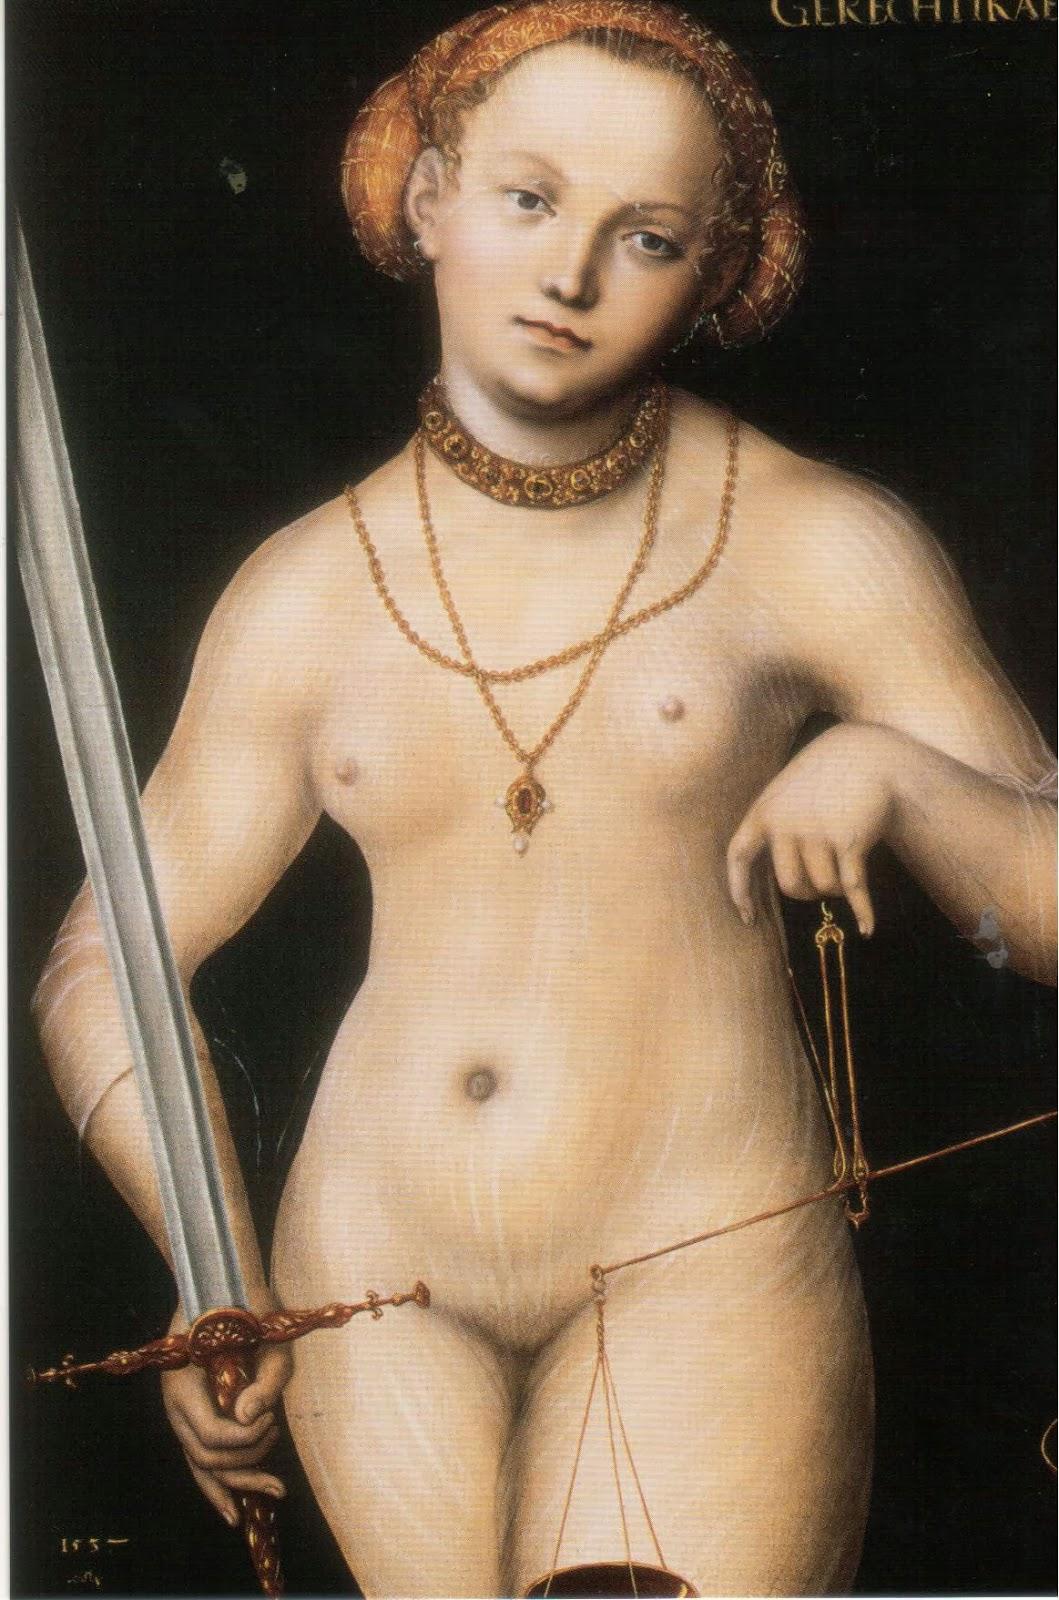 else kåss furuseth naken german porno